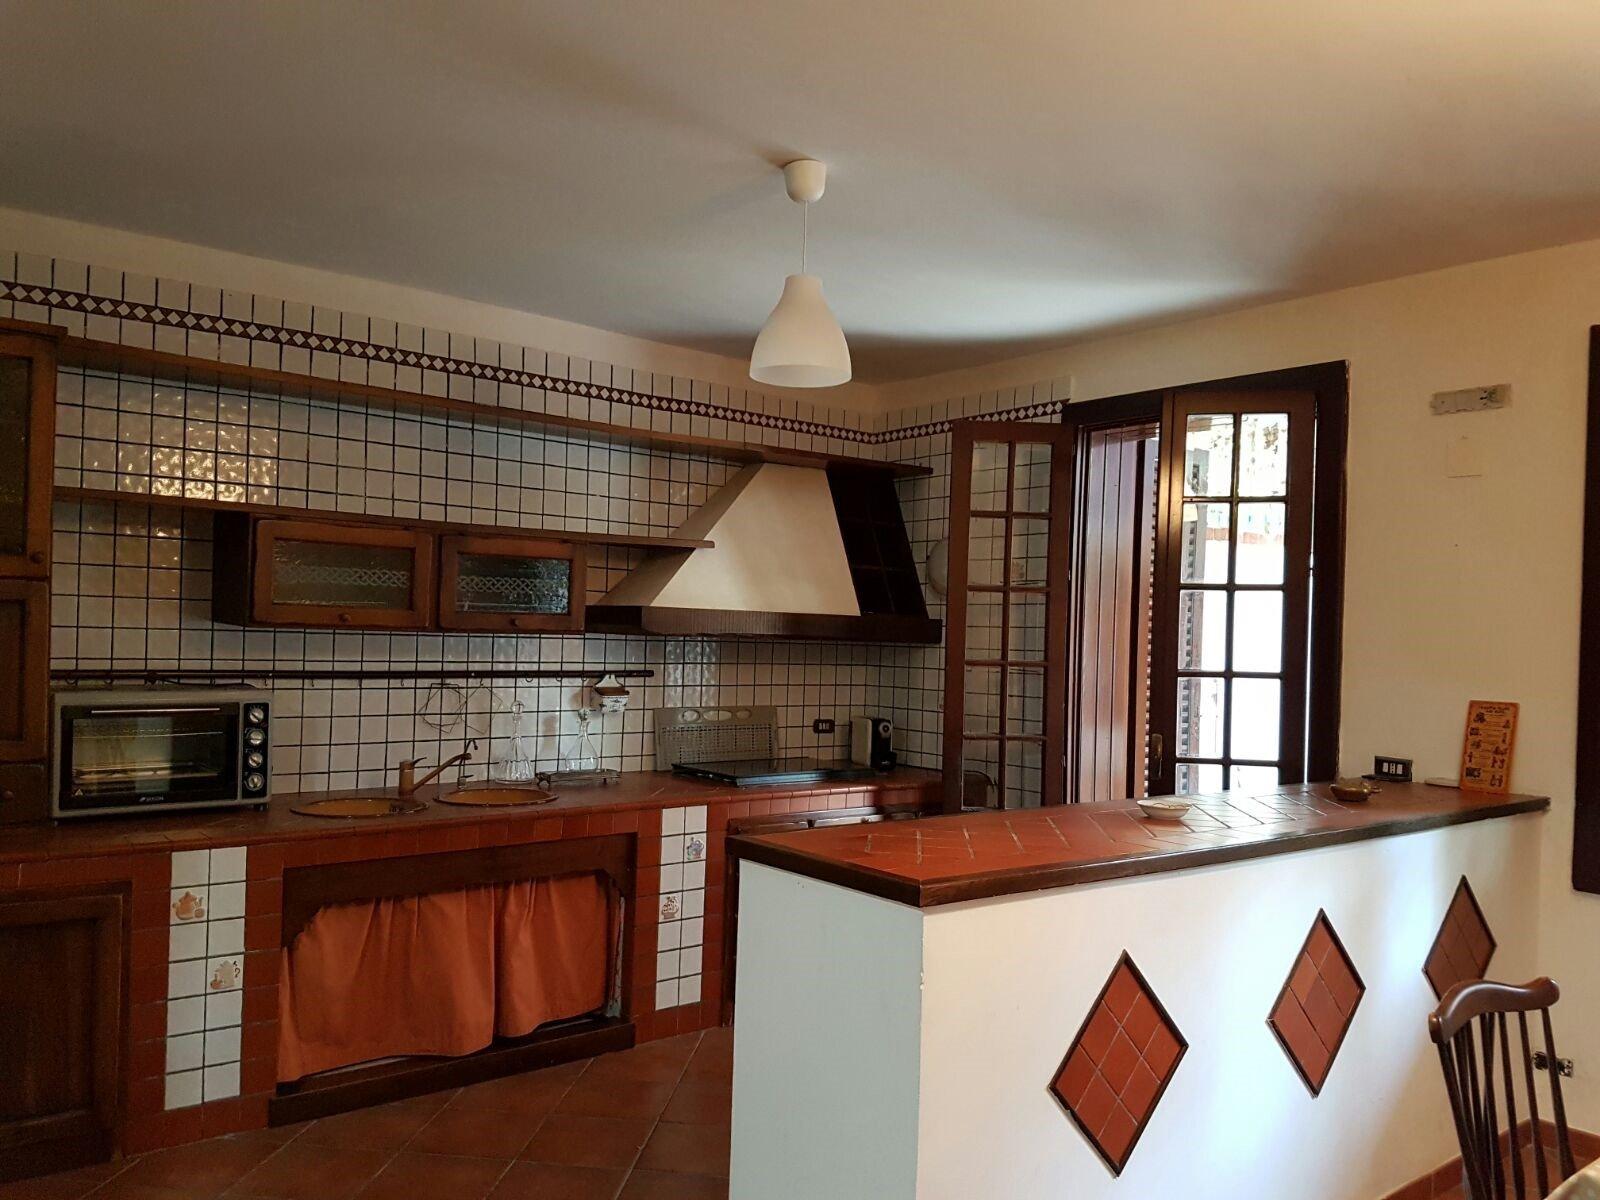 La cucina interna alla struttura